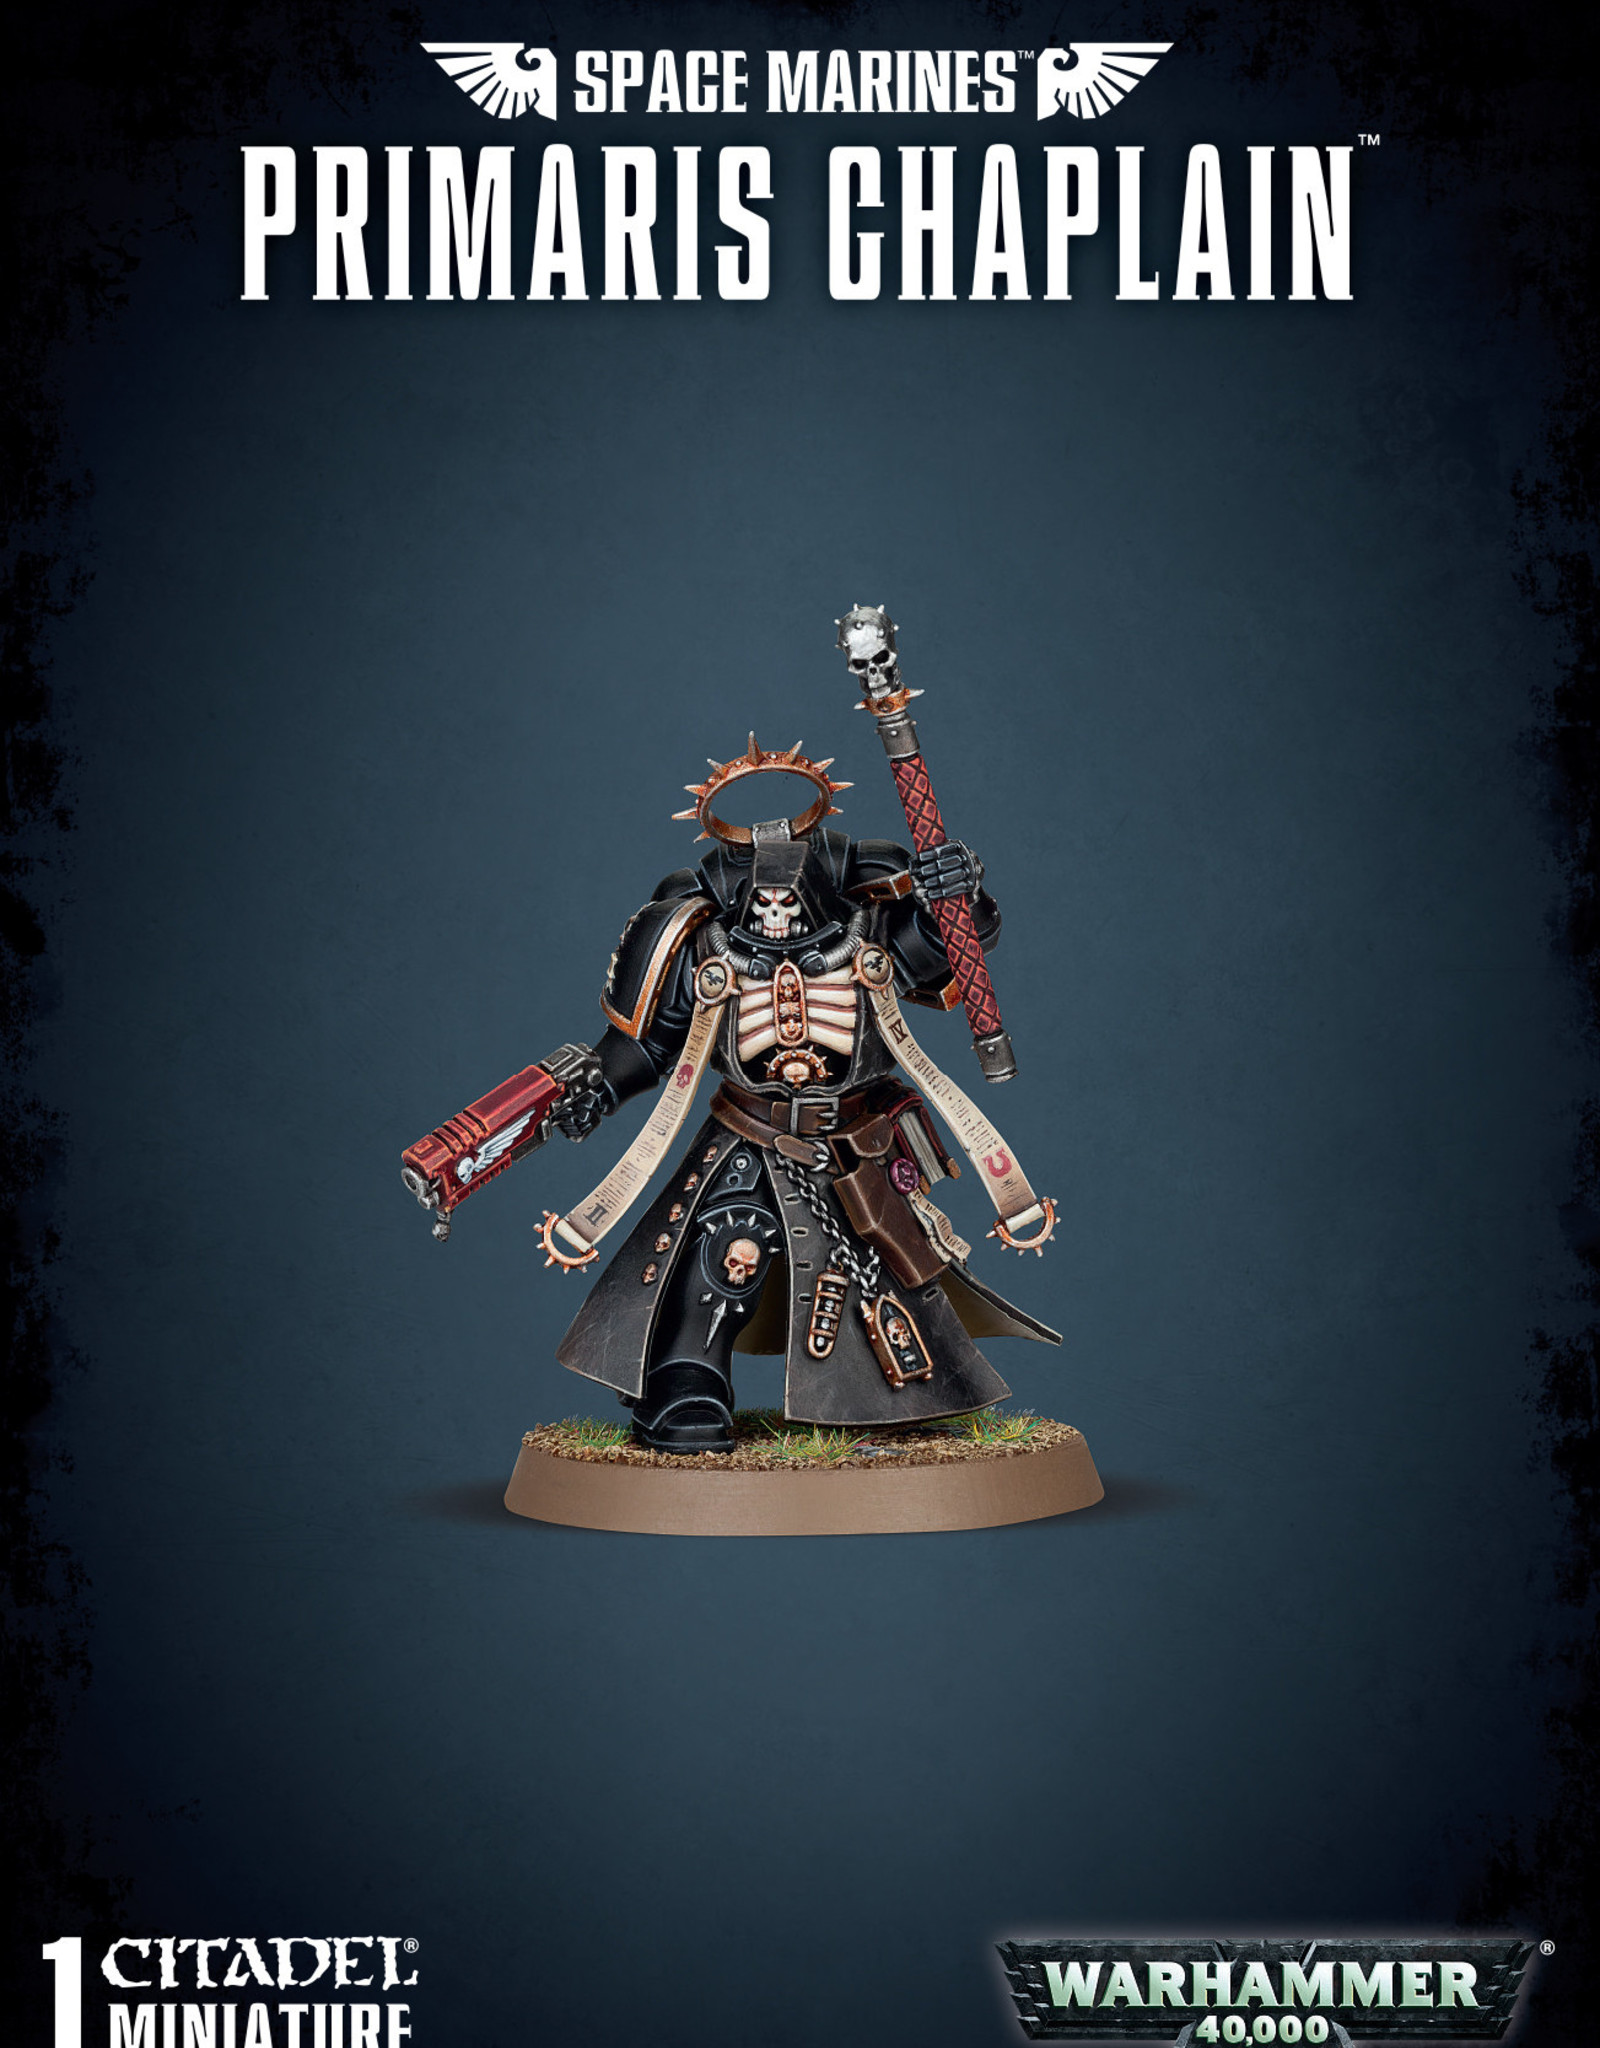 Warhammer 40K Space Marine Primaris Chaplain